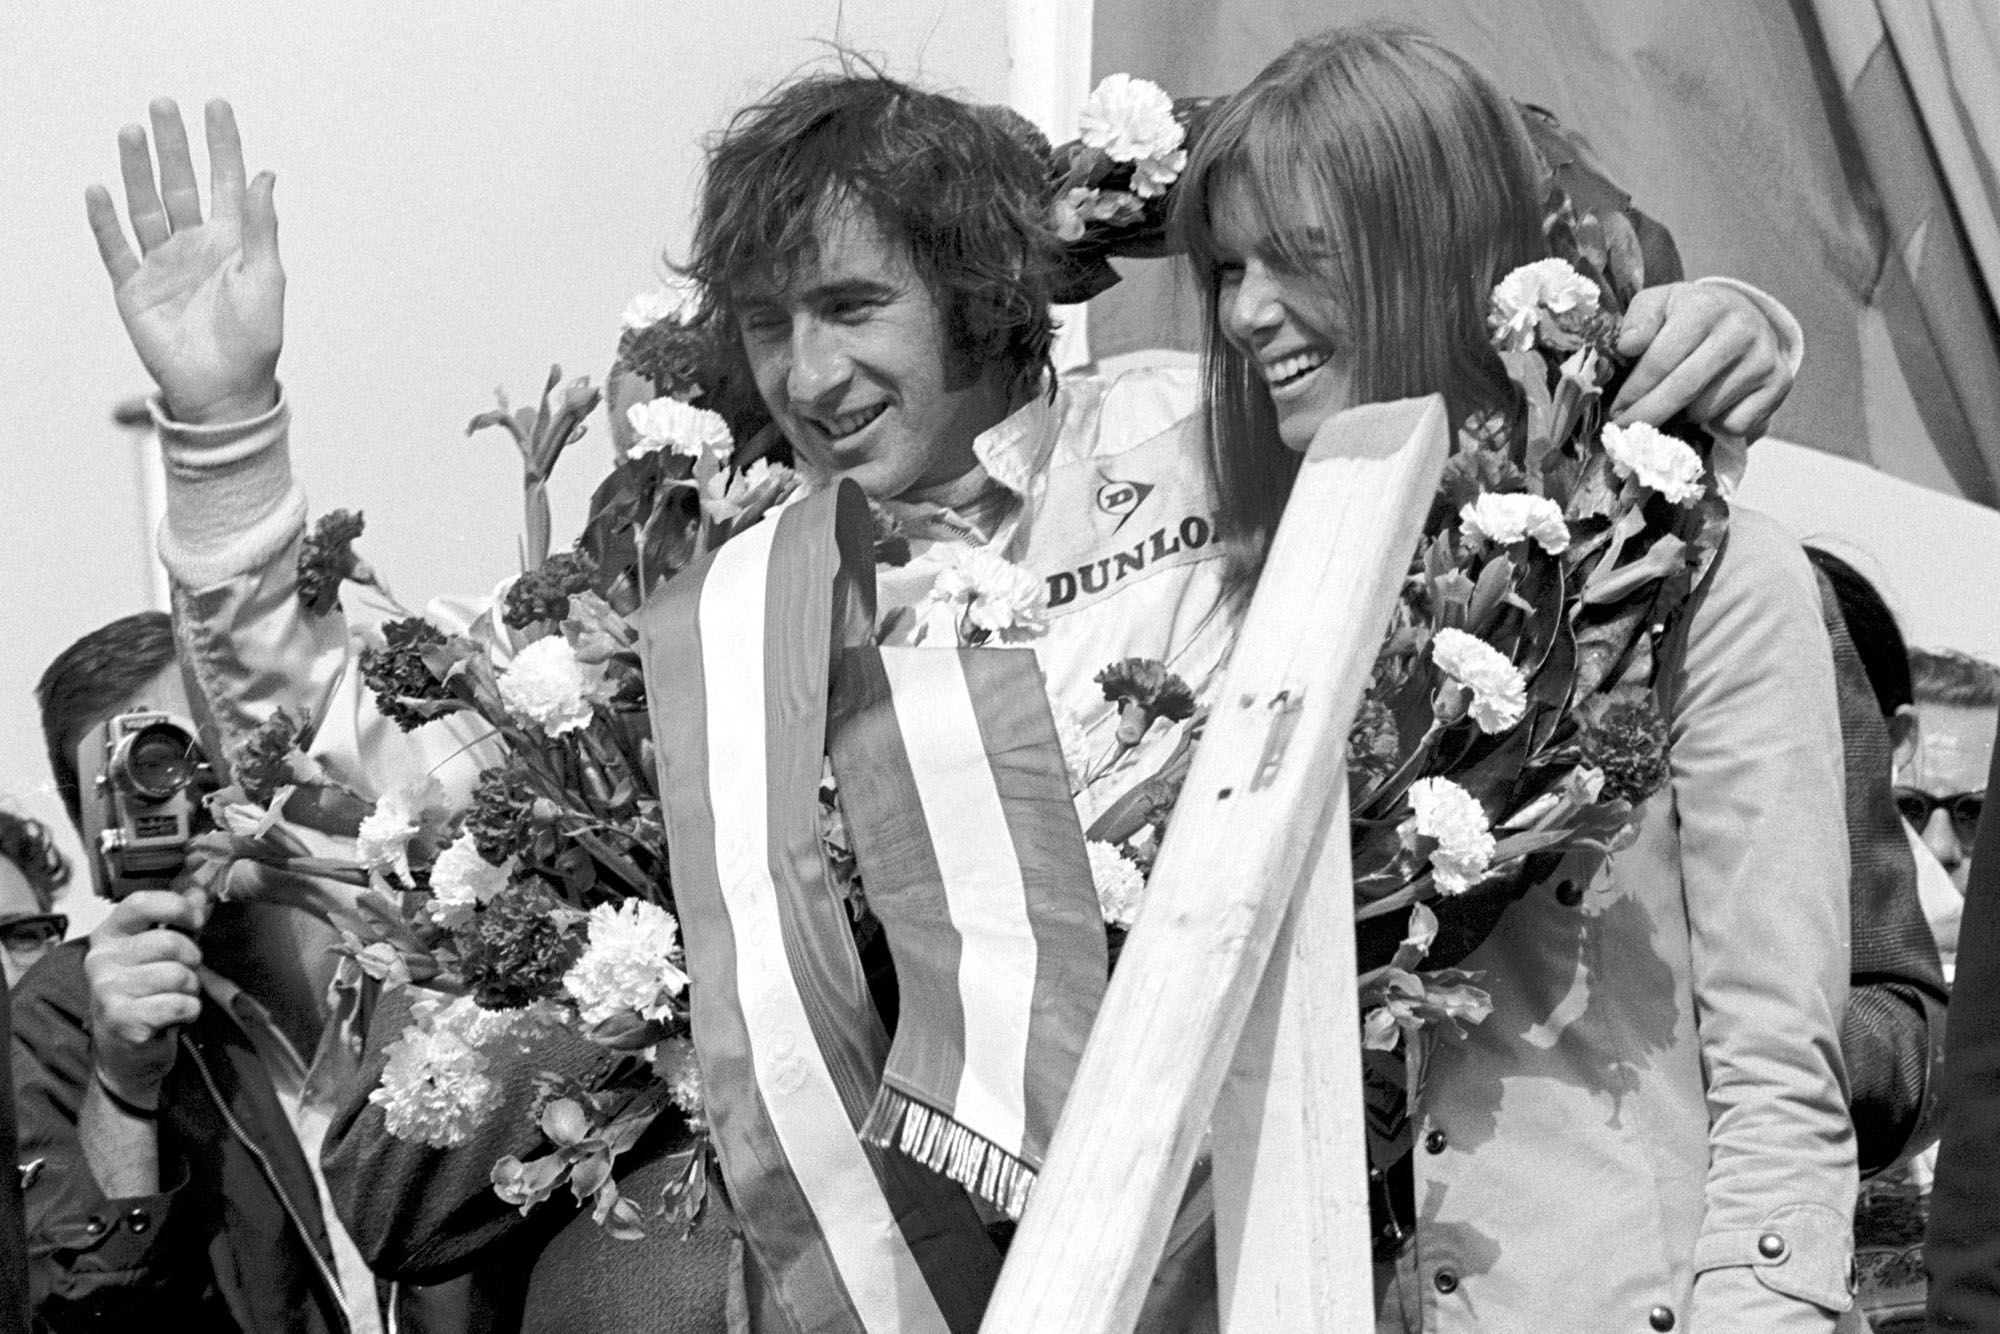 Jackie Stewart celebrates winning the 1969 Dutch Grand Prix on the podium